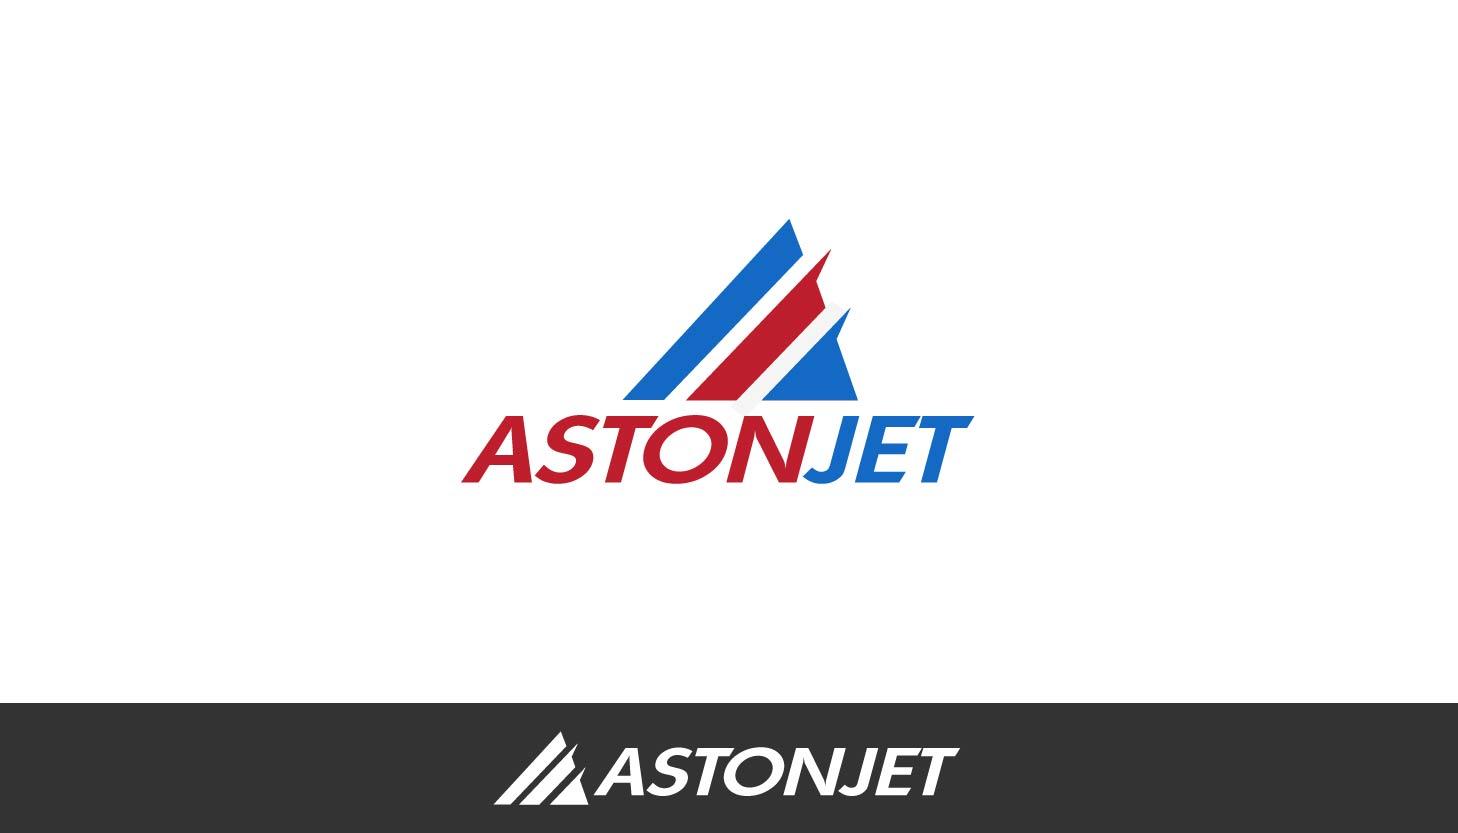 Aeroplane logo Vector  Premium Download  freepikcom